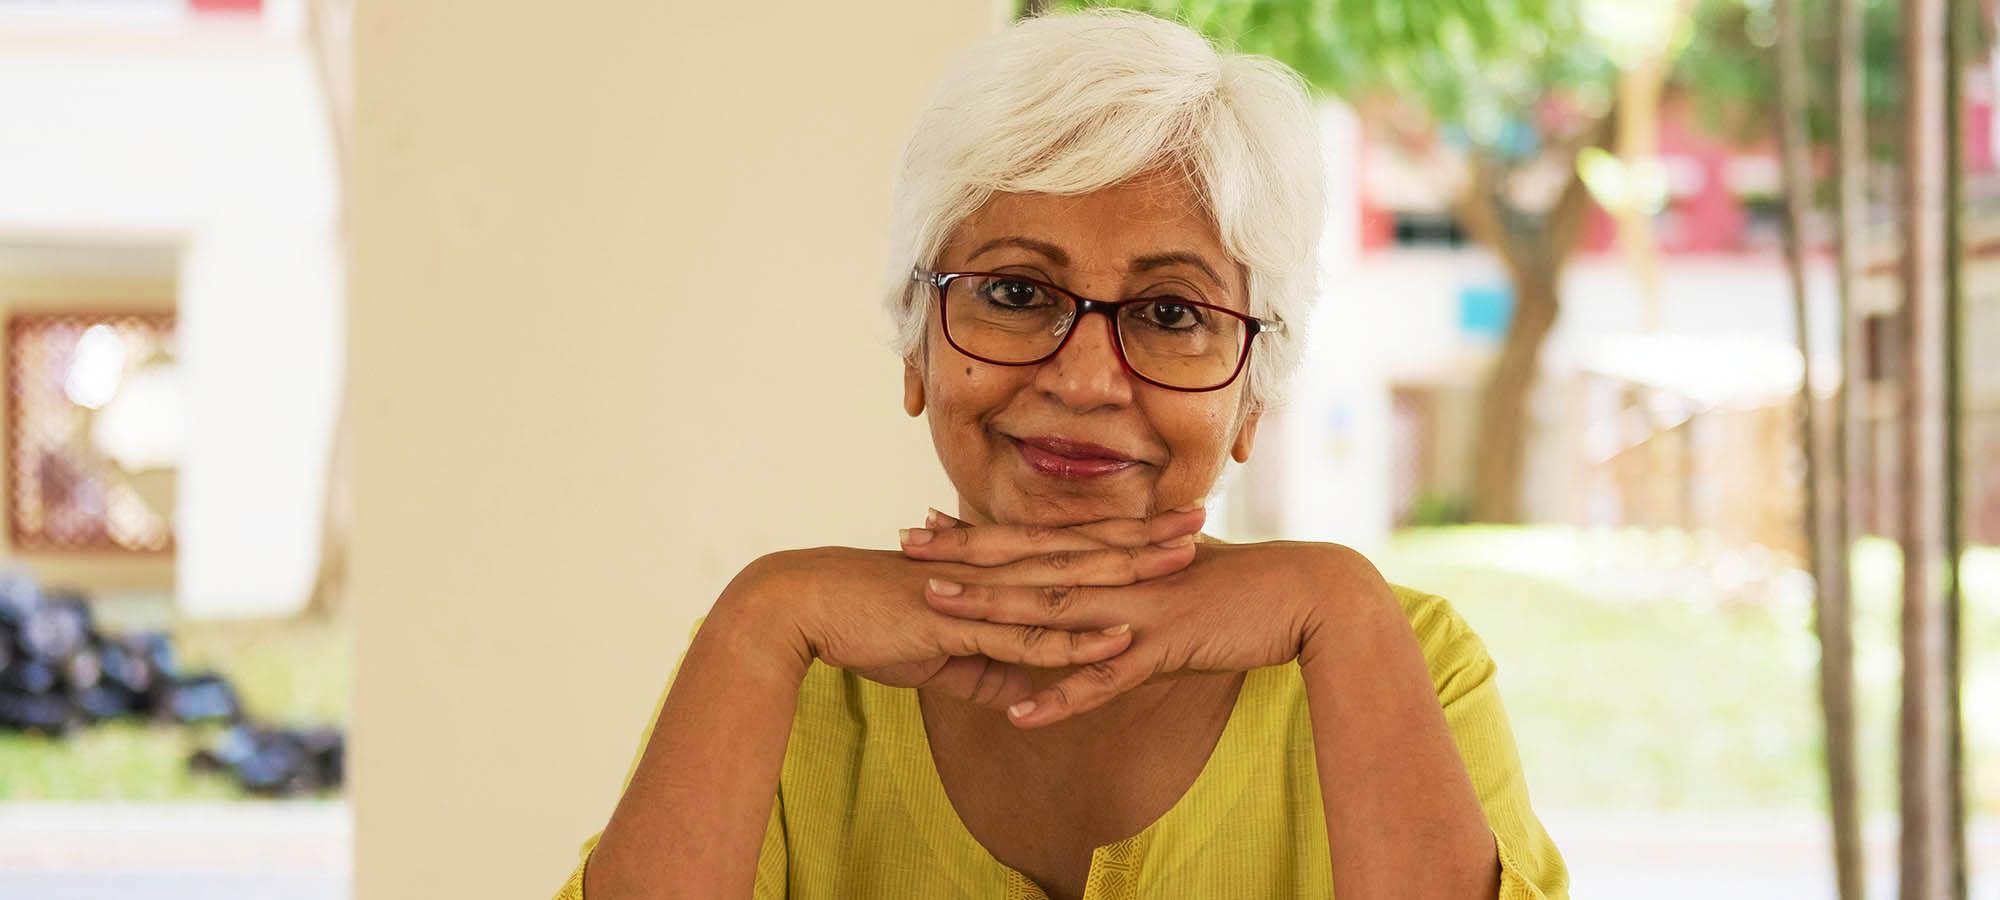 Nice Photo of Elderly Woman